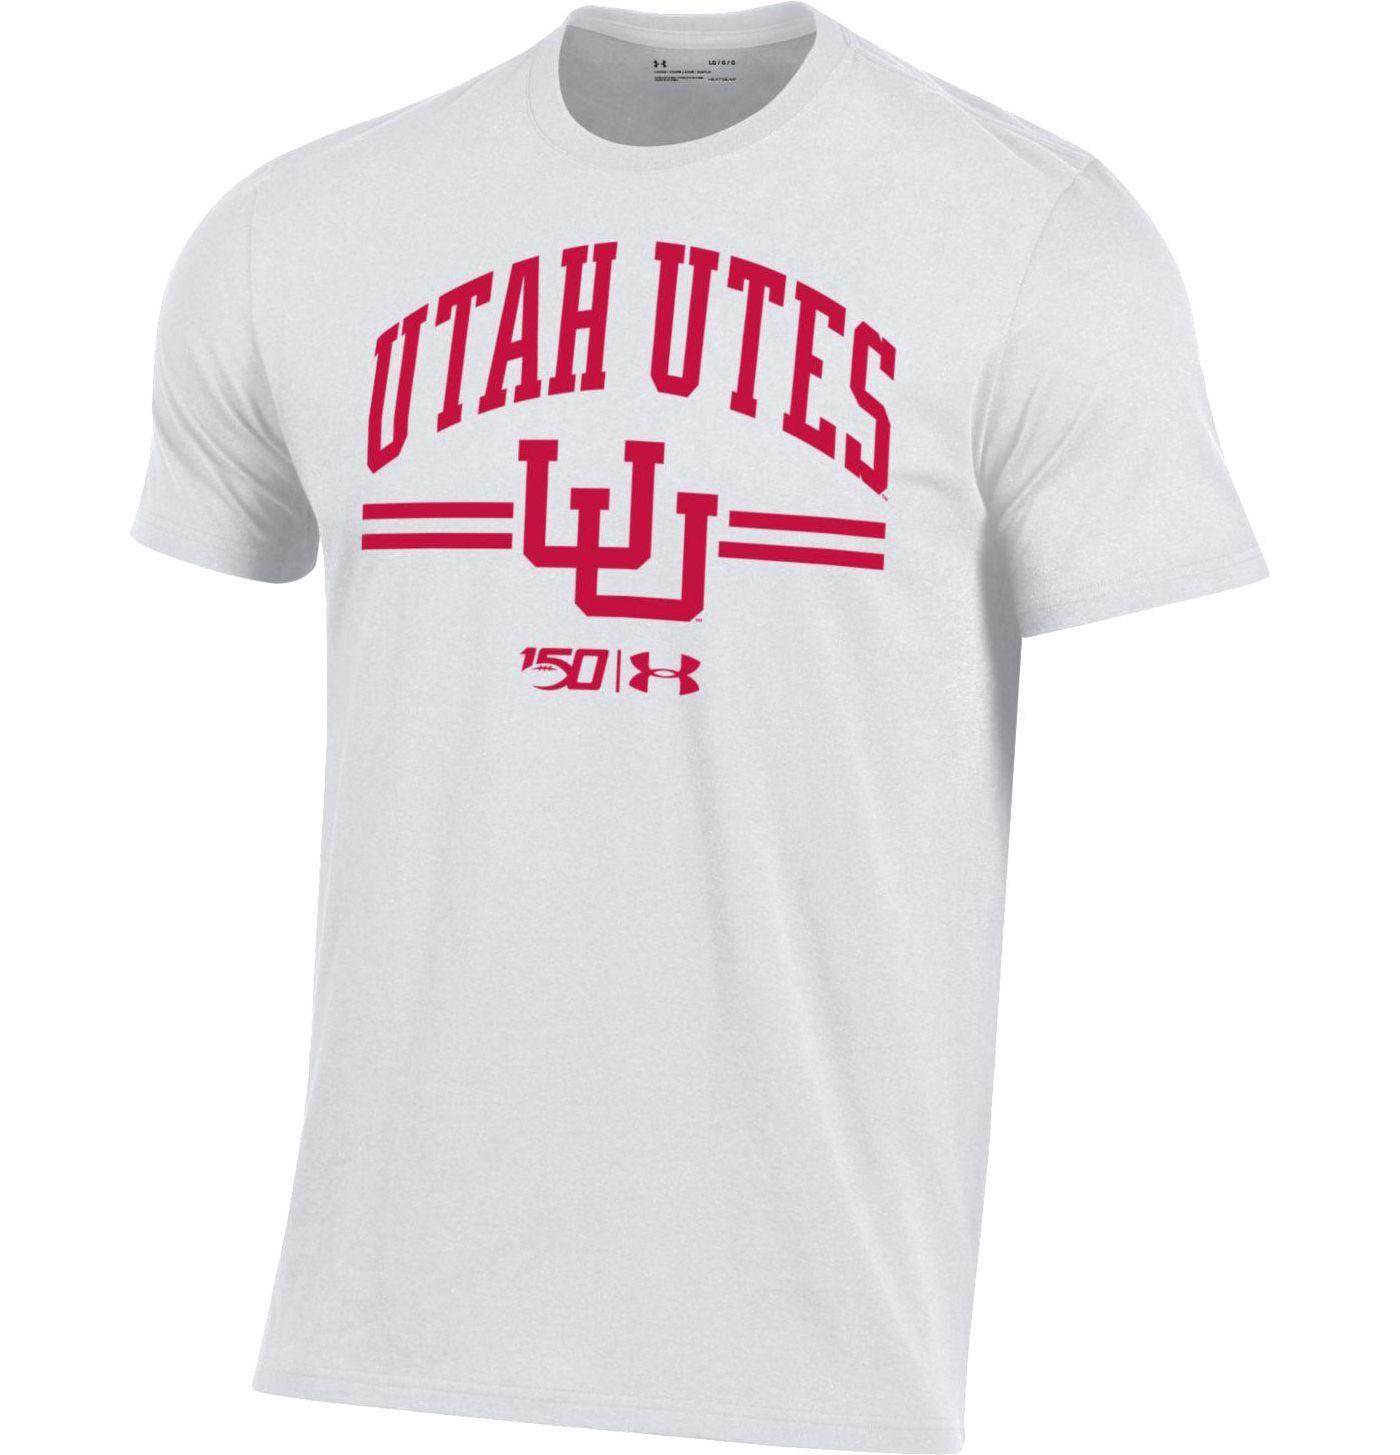 Under Armour Men's Utah Utes White 'CFB150' Performance Cotton Football T-Shirt